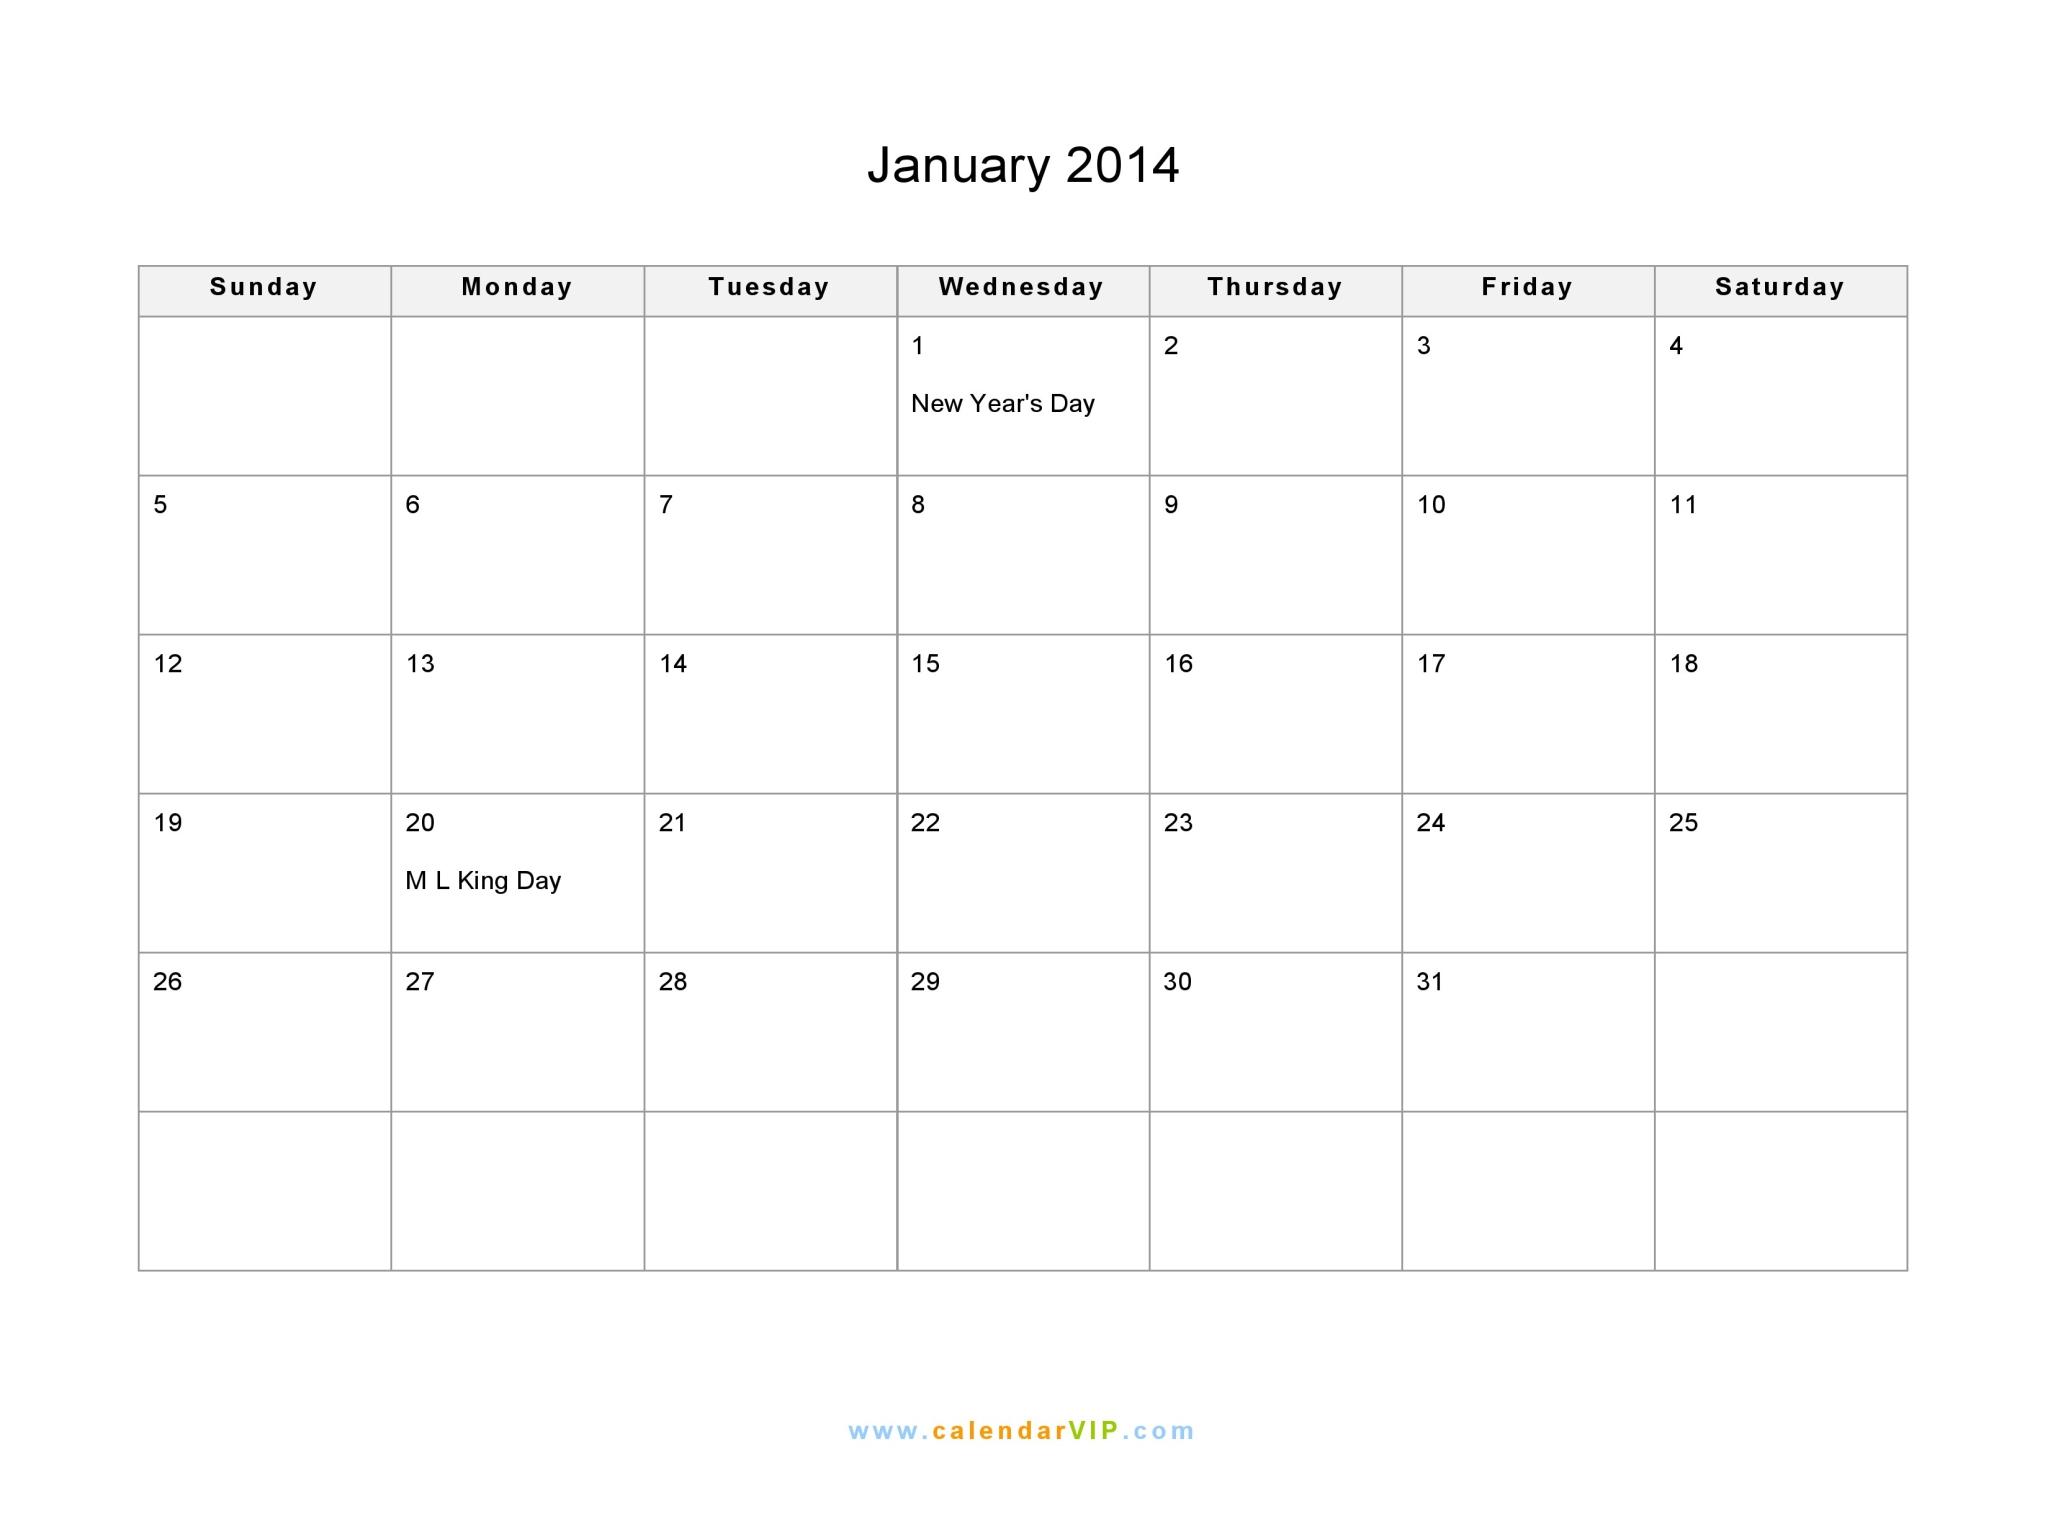 January 2014 Calendar - Blank Printable Calendar Template ... January 2014 Calendar Printable Portrait